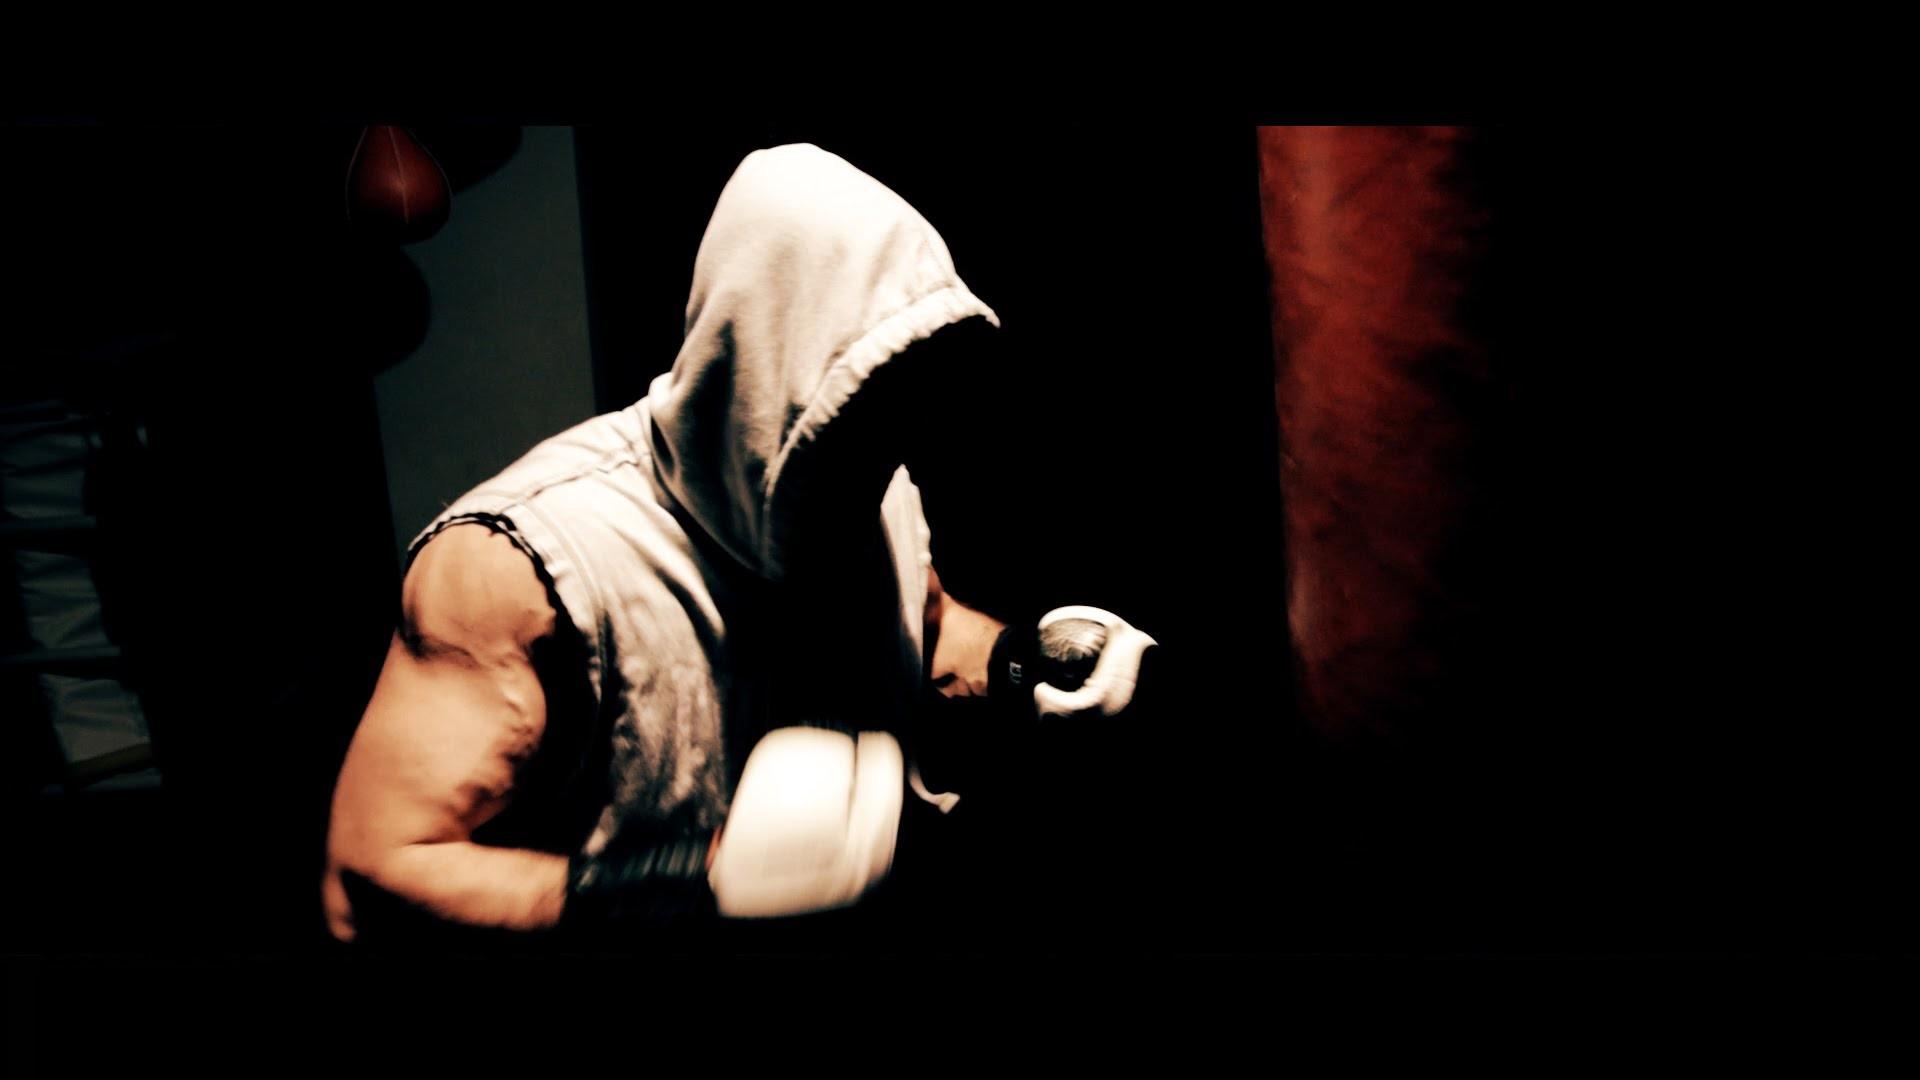 Kickboxing Wallpapers - impremedia.net